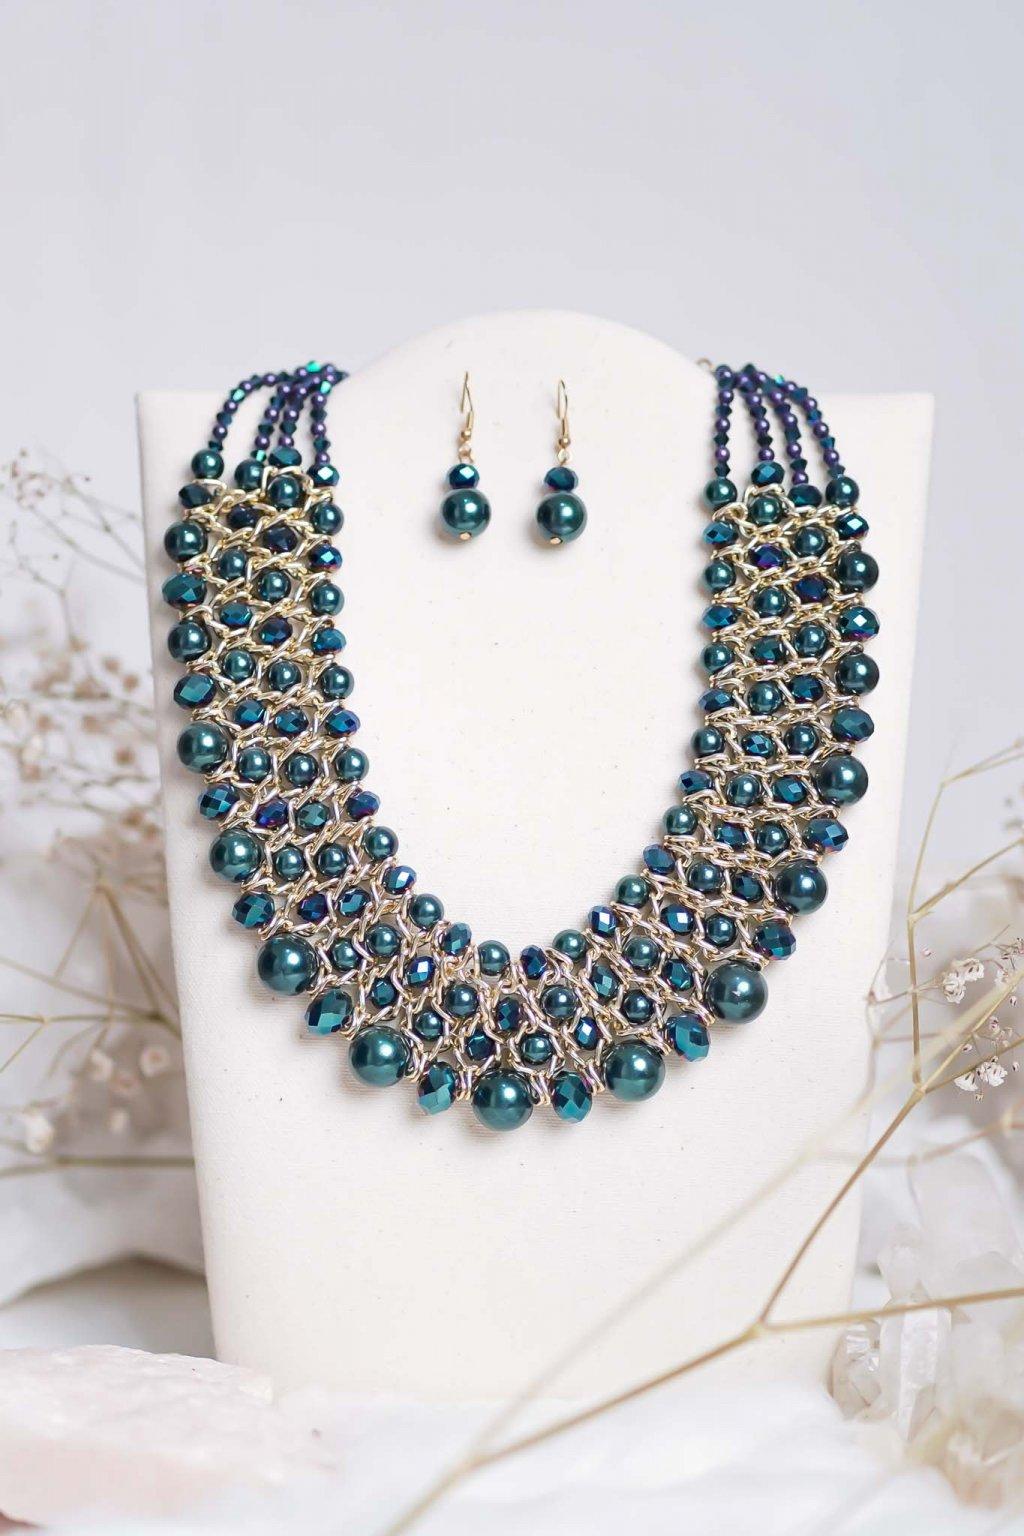 náhrdelník, šperk, spoločenská náhrdelník, náhrdelník na bežný deň, výrazný náhrdelník, jemný náhrdelník, šperky, náhrdelník na ples, svadbu, stužkovú 22